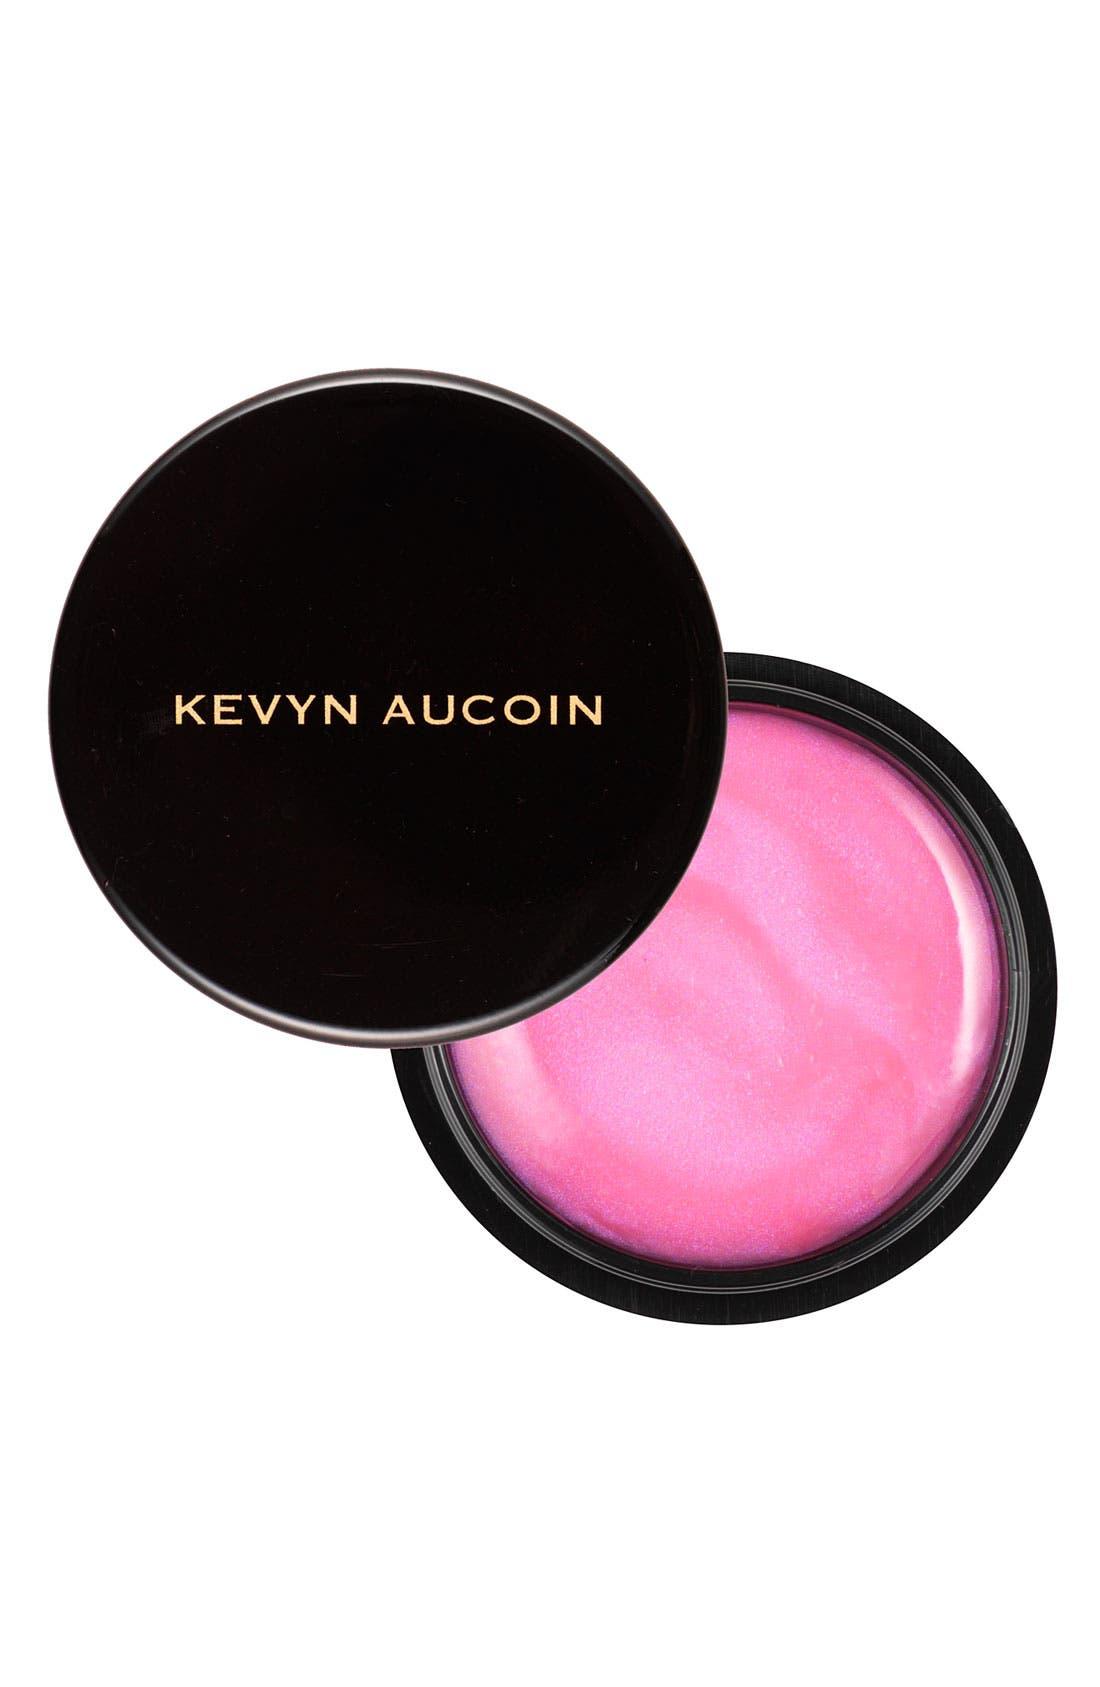 Kevyn Aucoin Beauty 'The Elegant' Lip Gloss